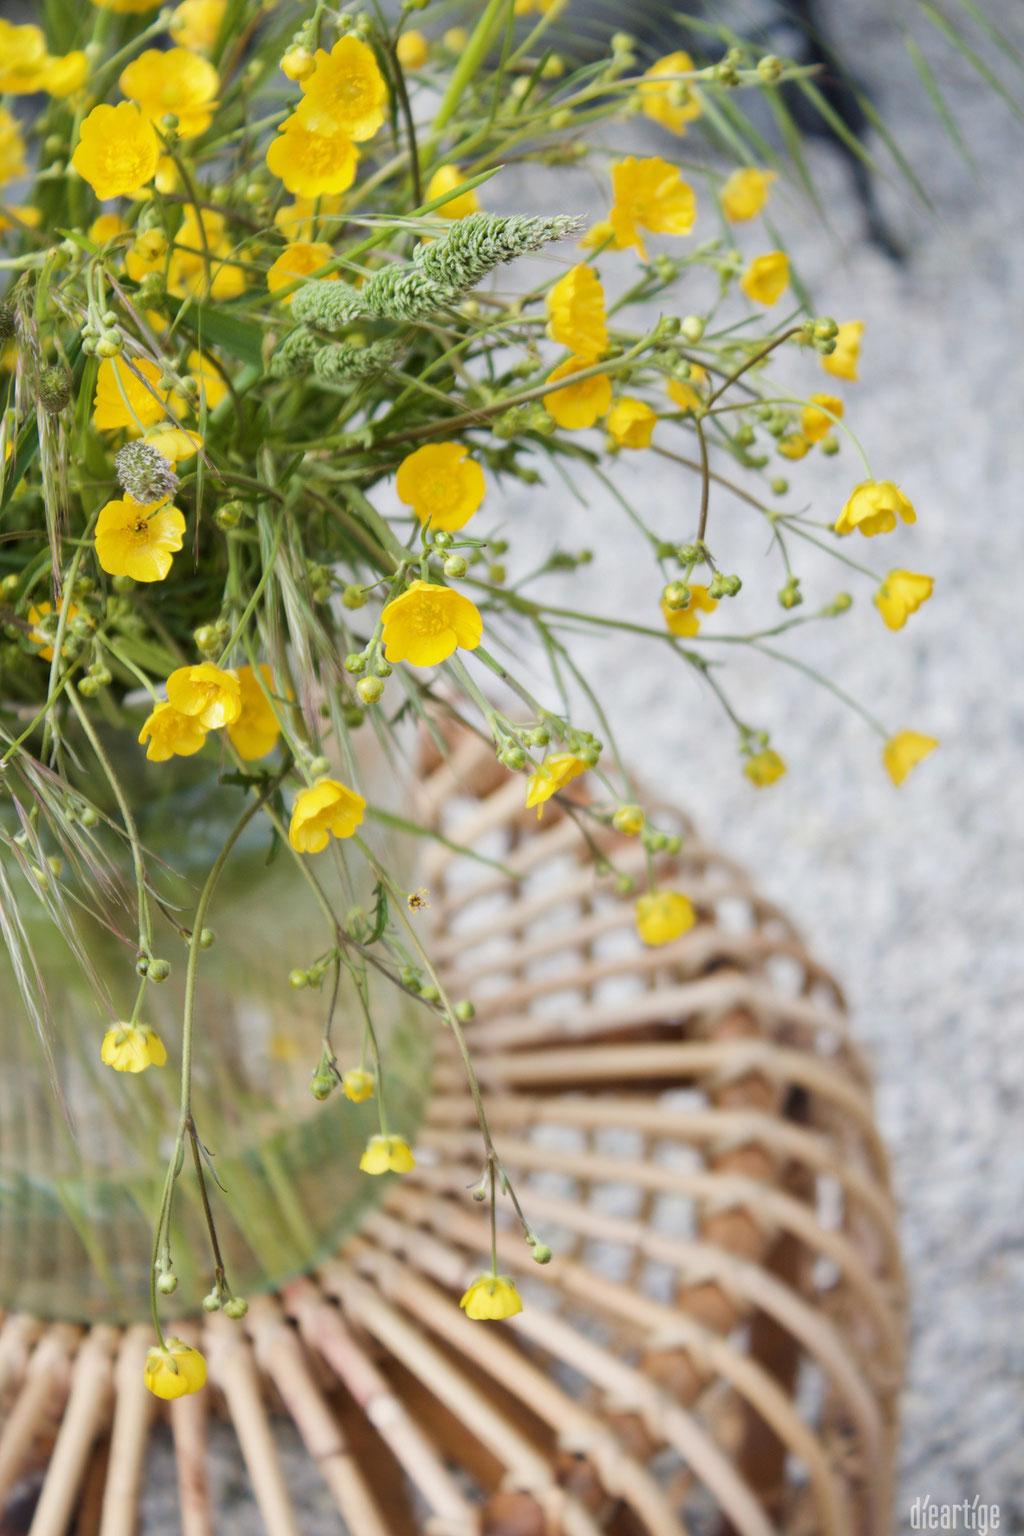 dieartigeBLOG - Rattan-Hocker, Kies-Terrasse, Wiesenblumen, gelb